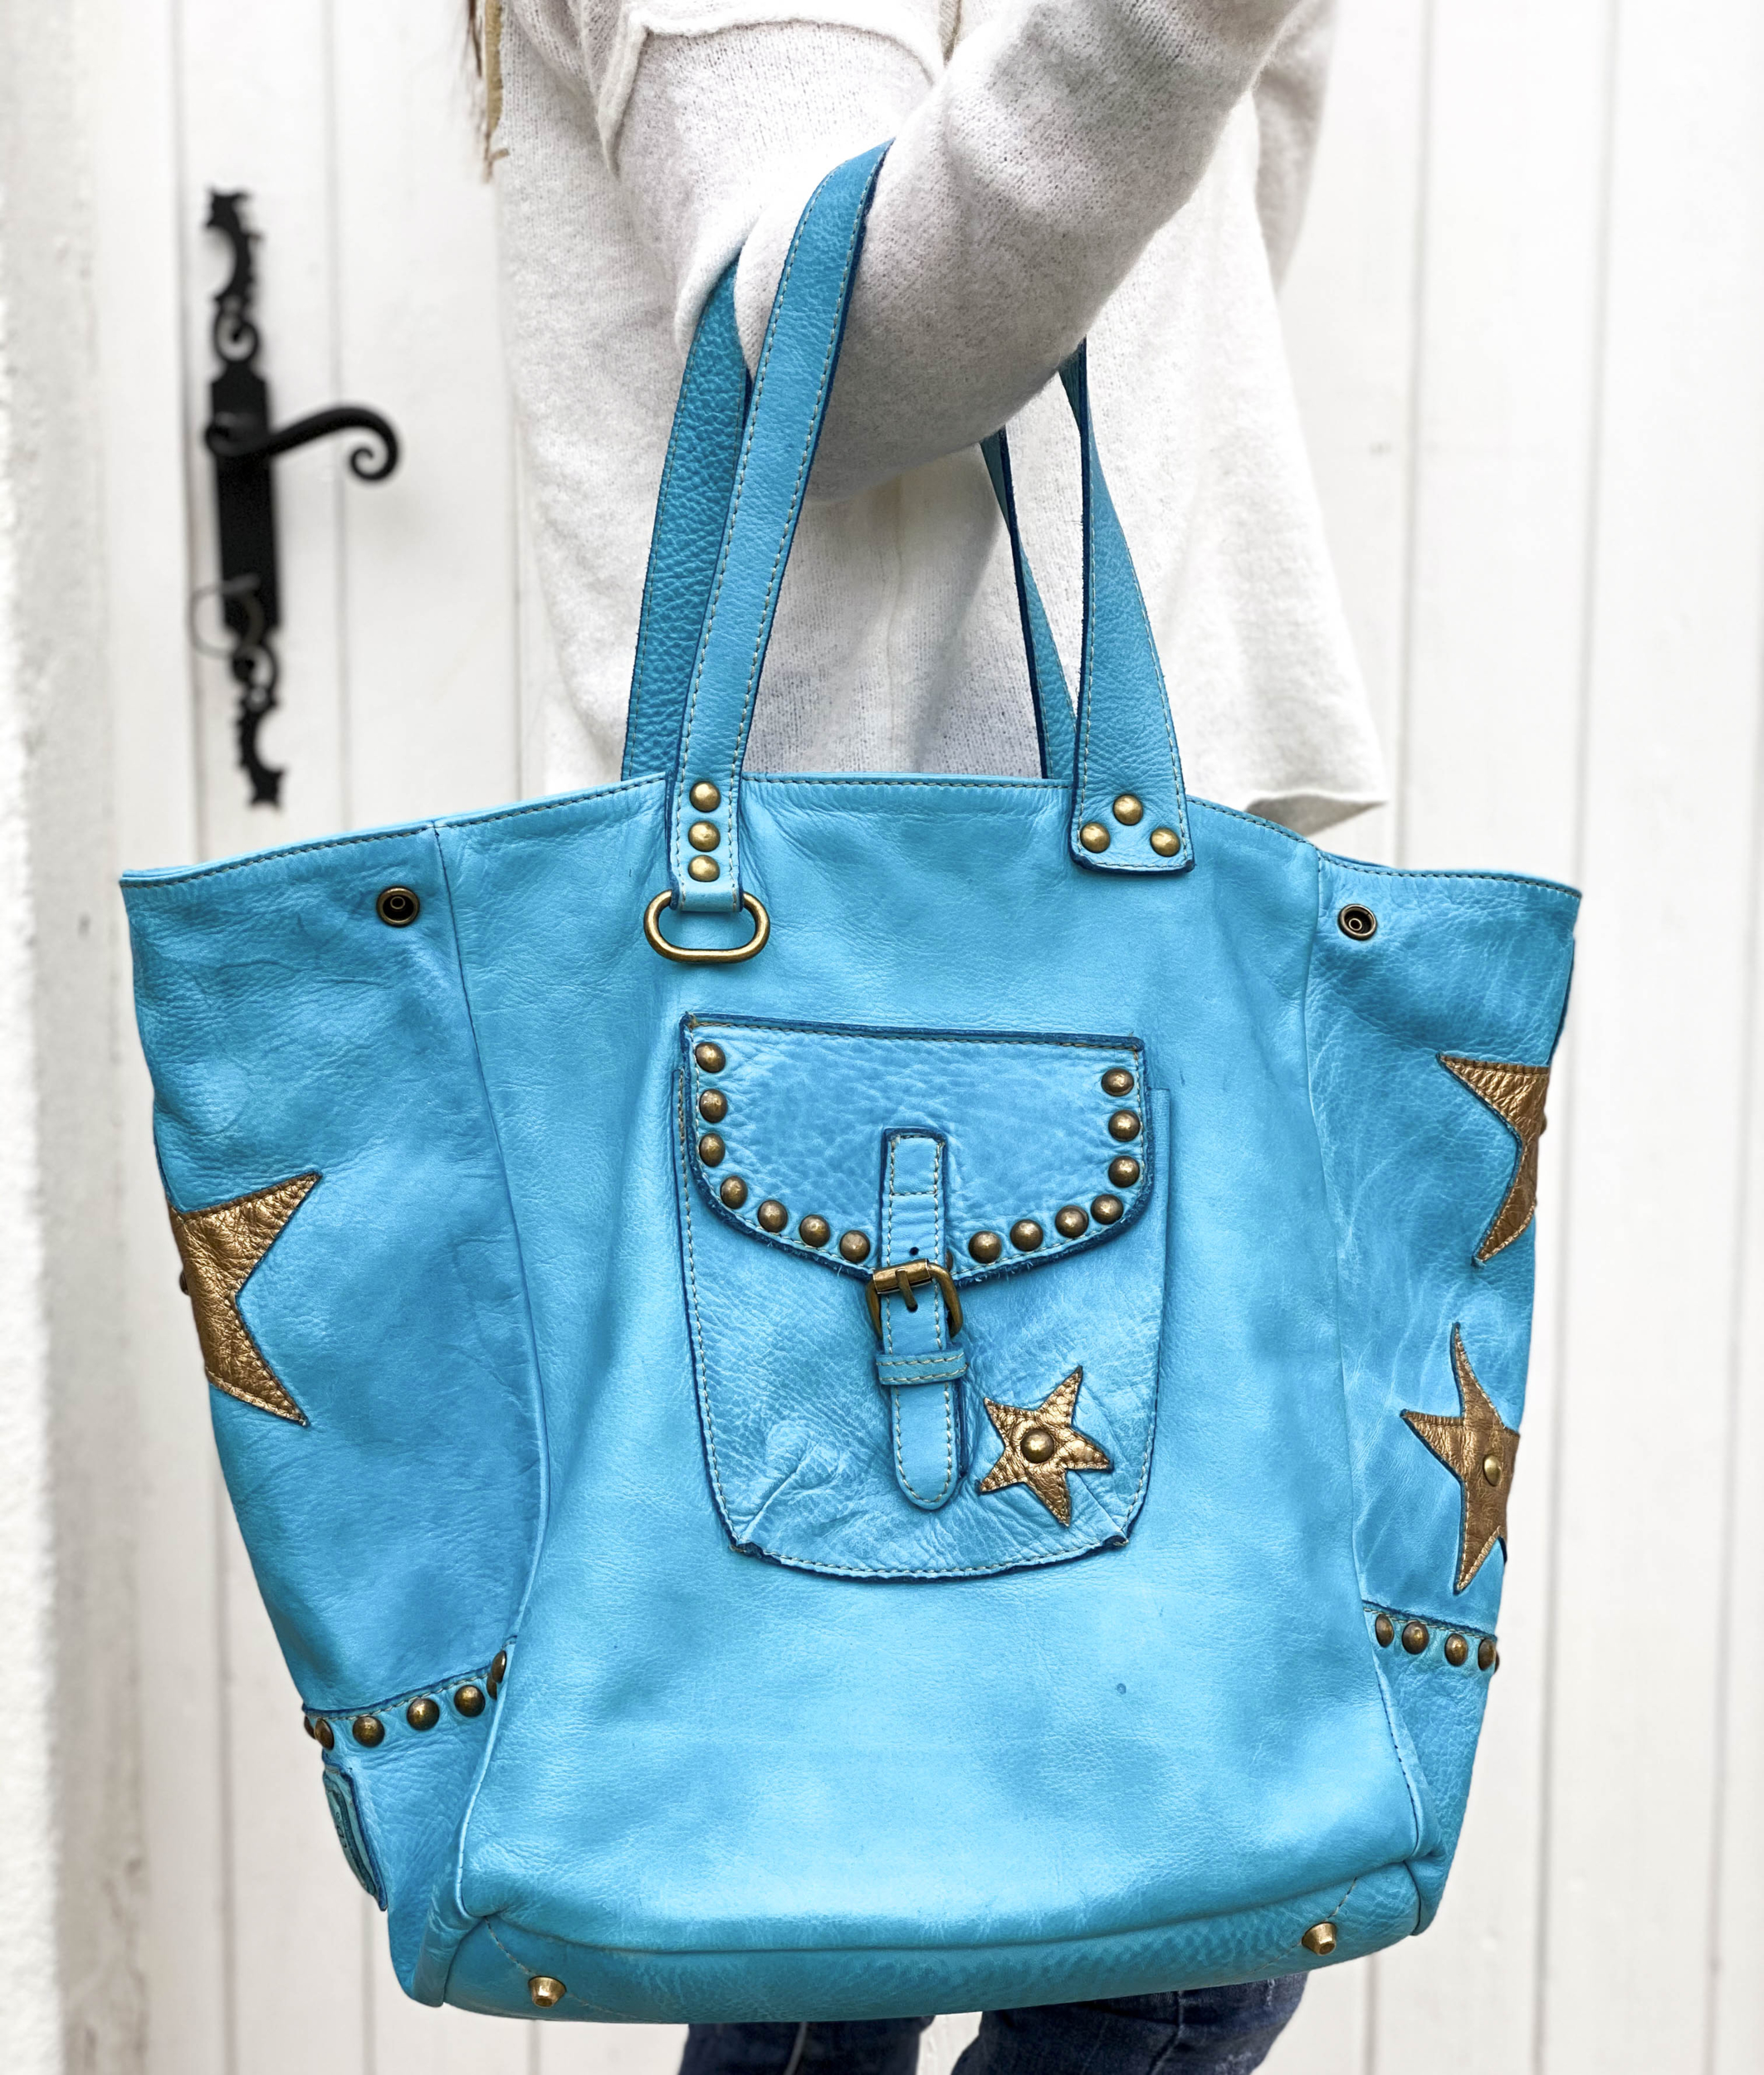 Sac CHIARA turquoise